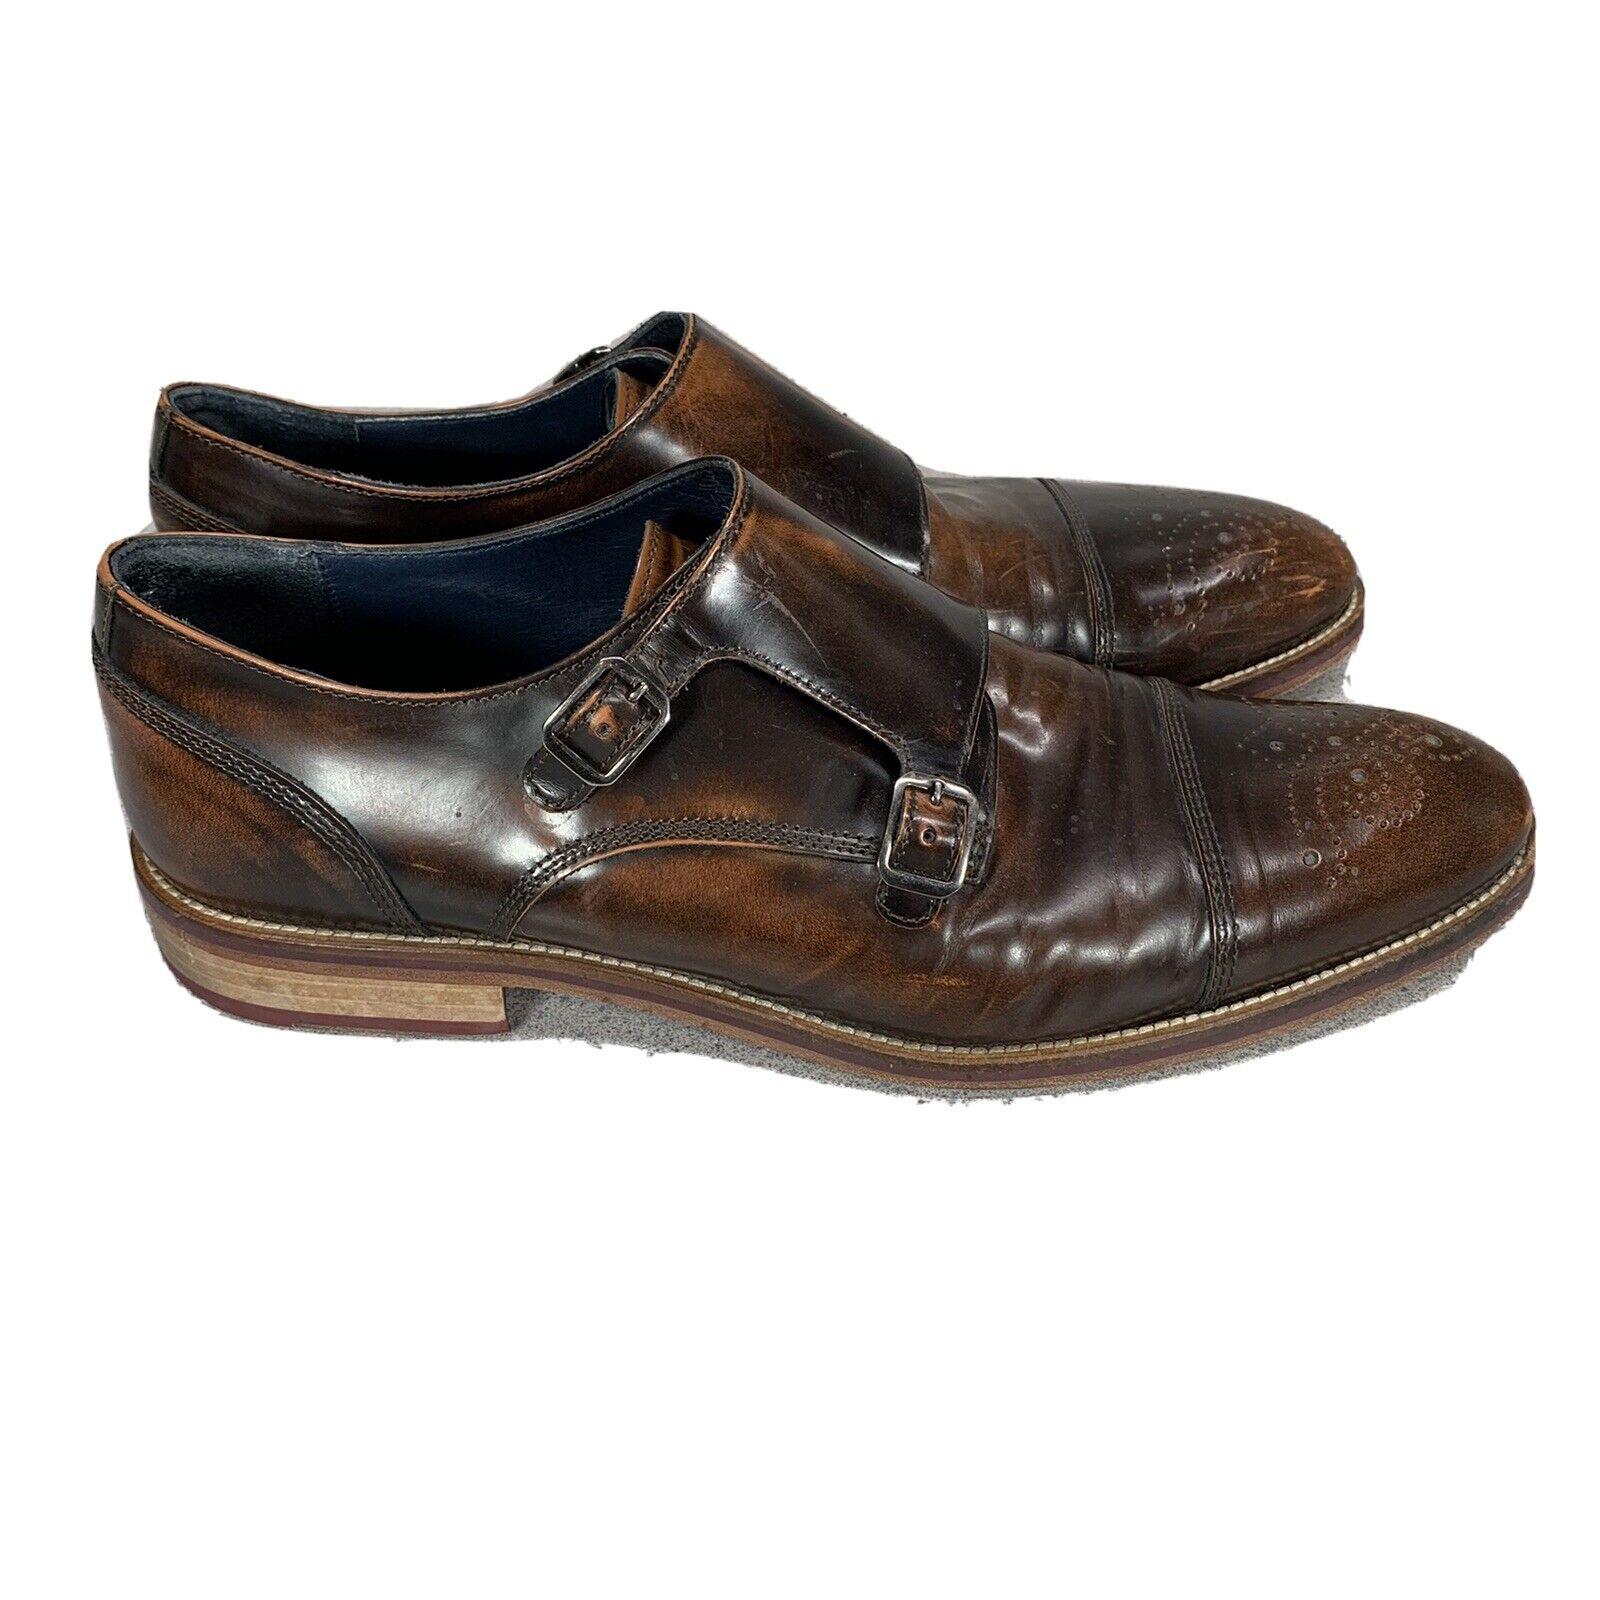 Mens Johnston & Murphy Wingtip Dbl Monkstrap Bronze Brown Dress Shoes Italy 11M